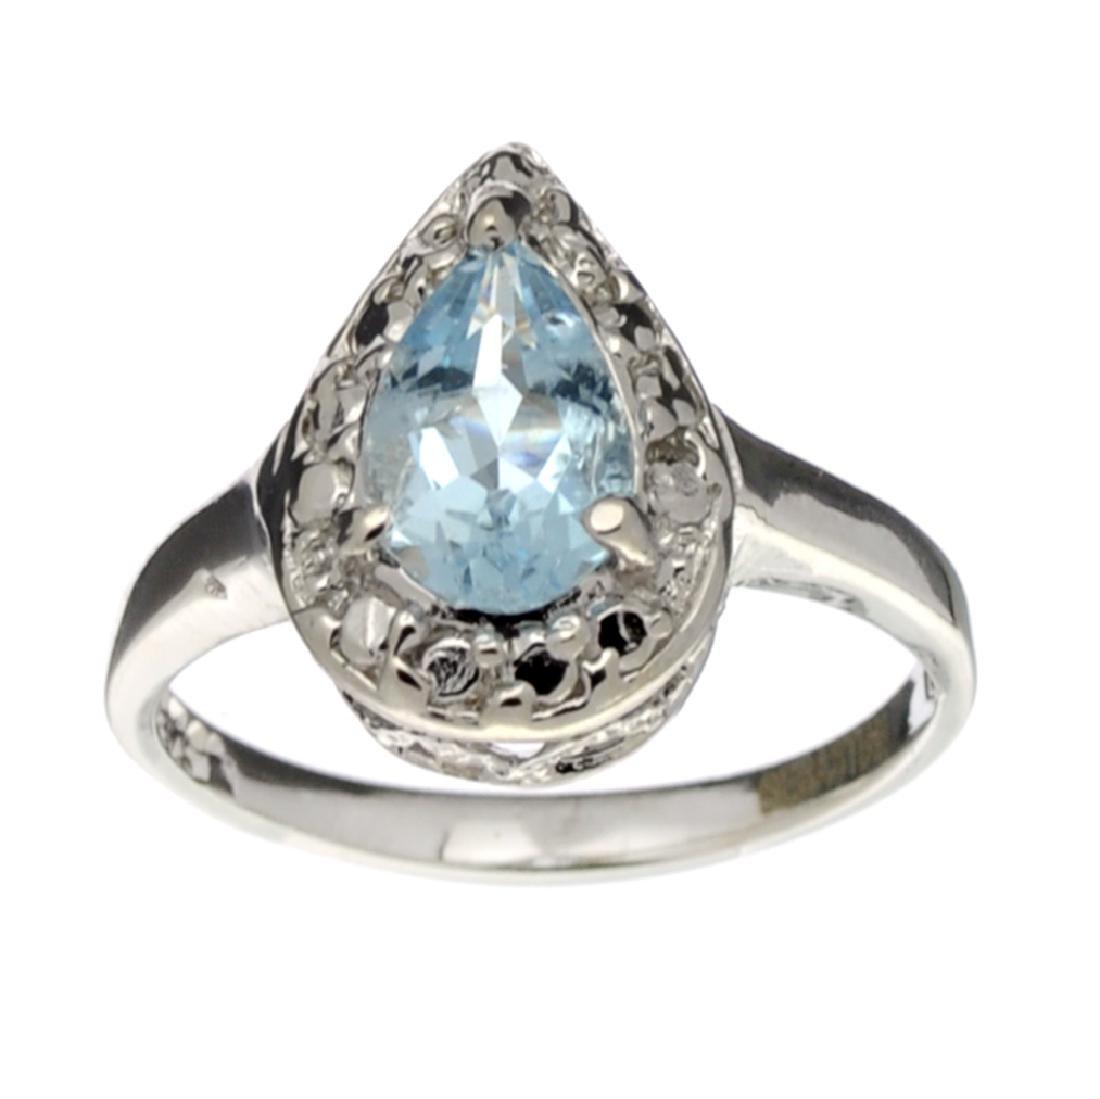 Fine Jewelry Designer Sebastian, Aquamarine And White